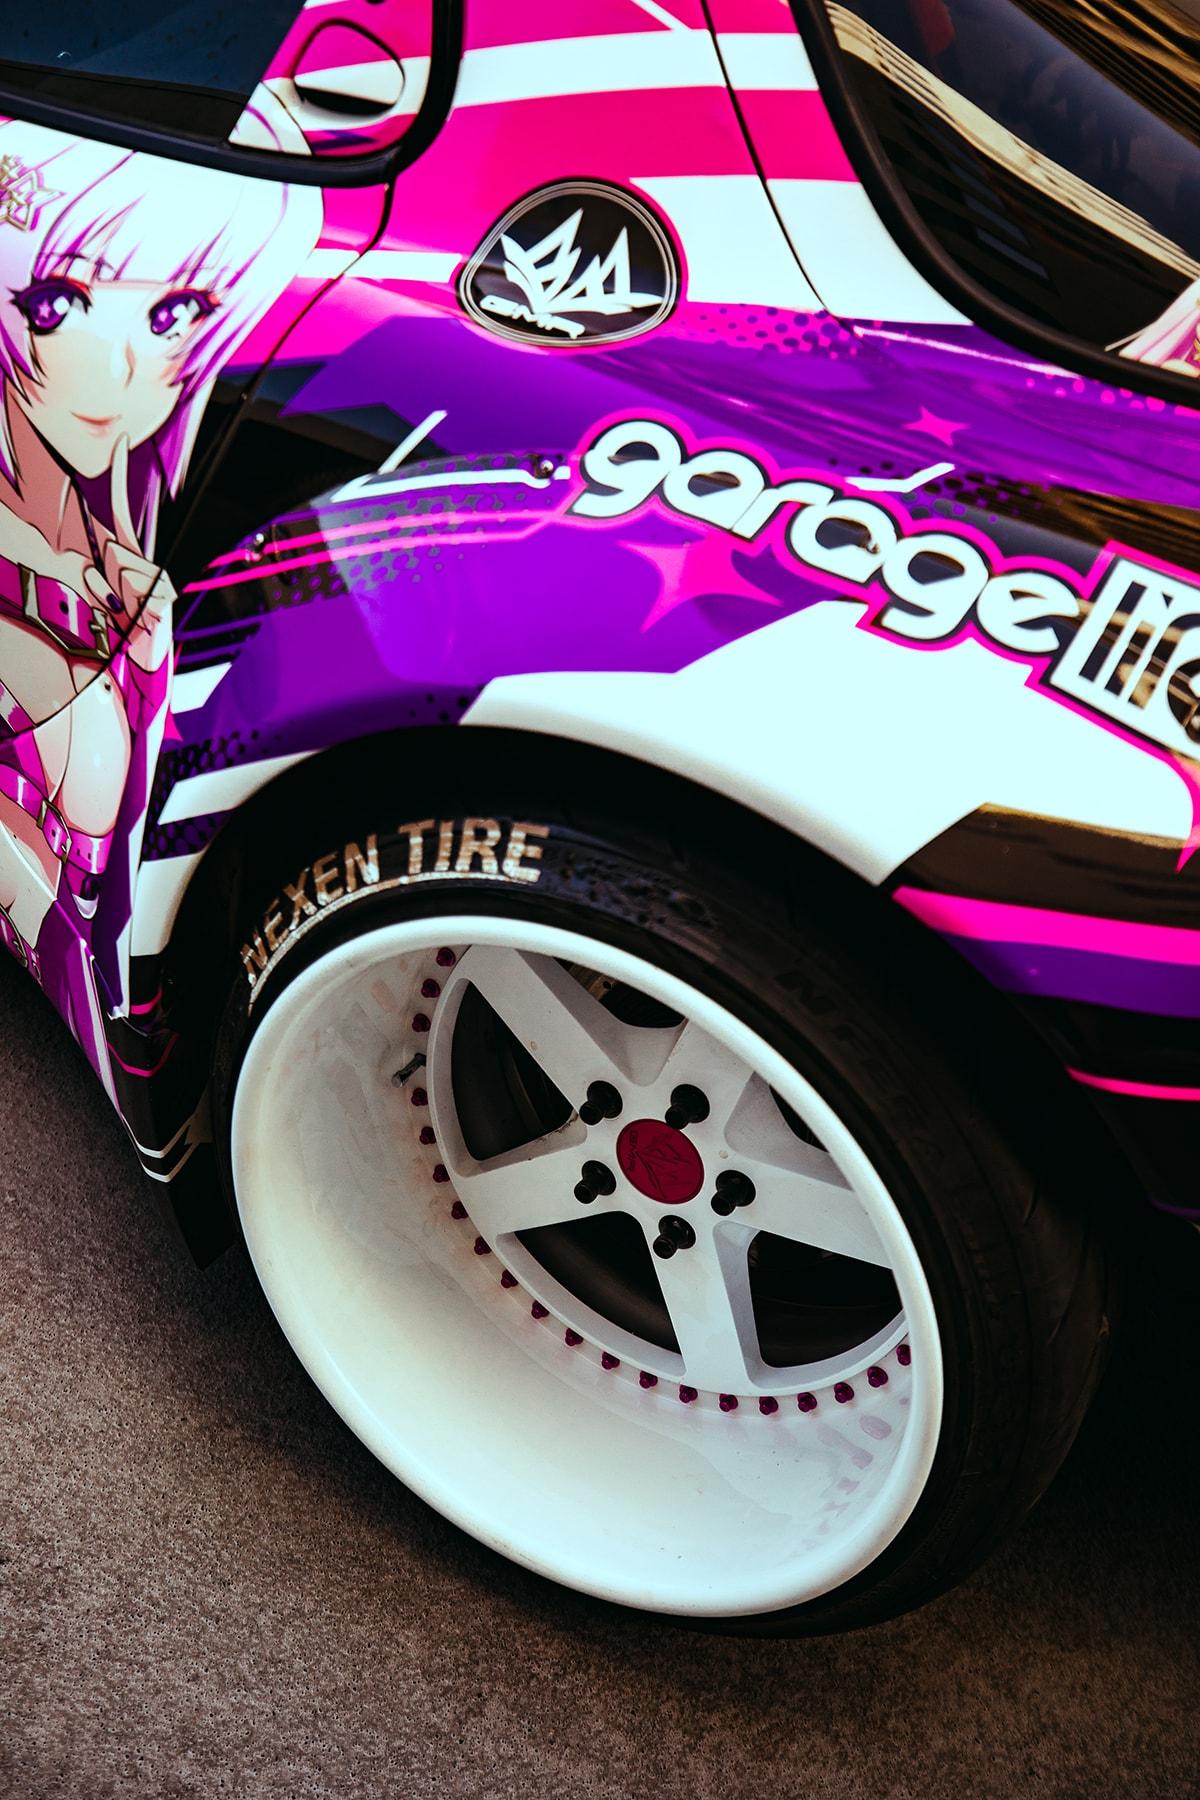 Sara Choi's 1993 Mazda RX-7 Drift Car: DRIVERS itasha anime gaming power over it youtube channel host model